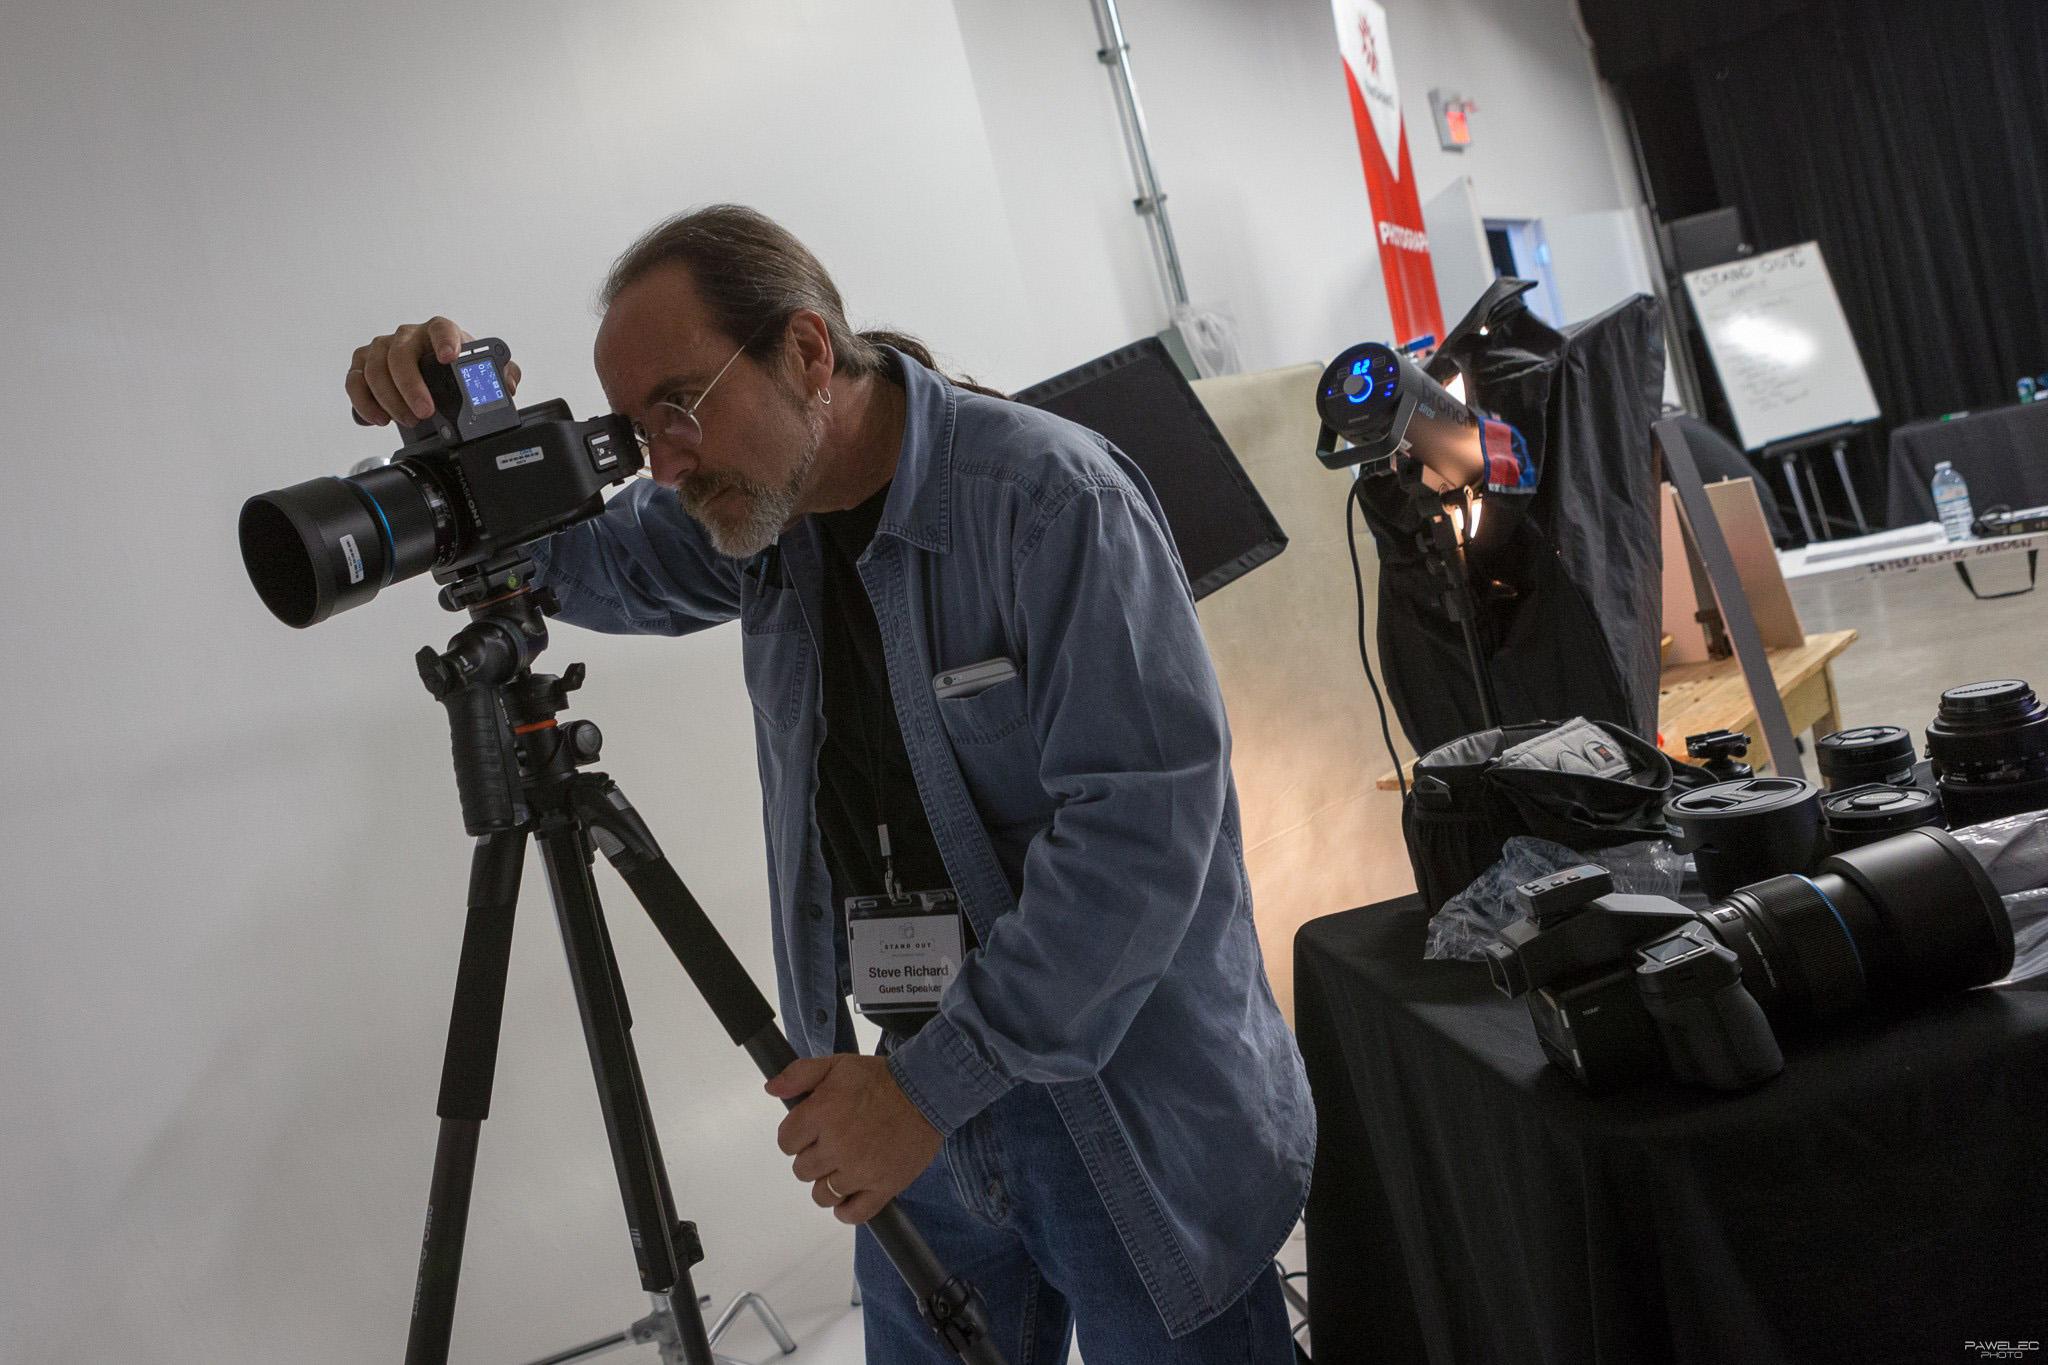 STAND-OUT-Photo-Forum-Toronto-11-10-16-PAWELECphoto-21.jpg